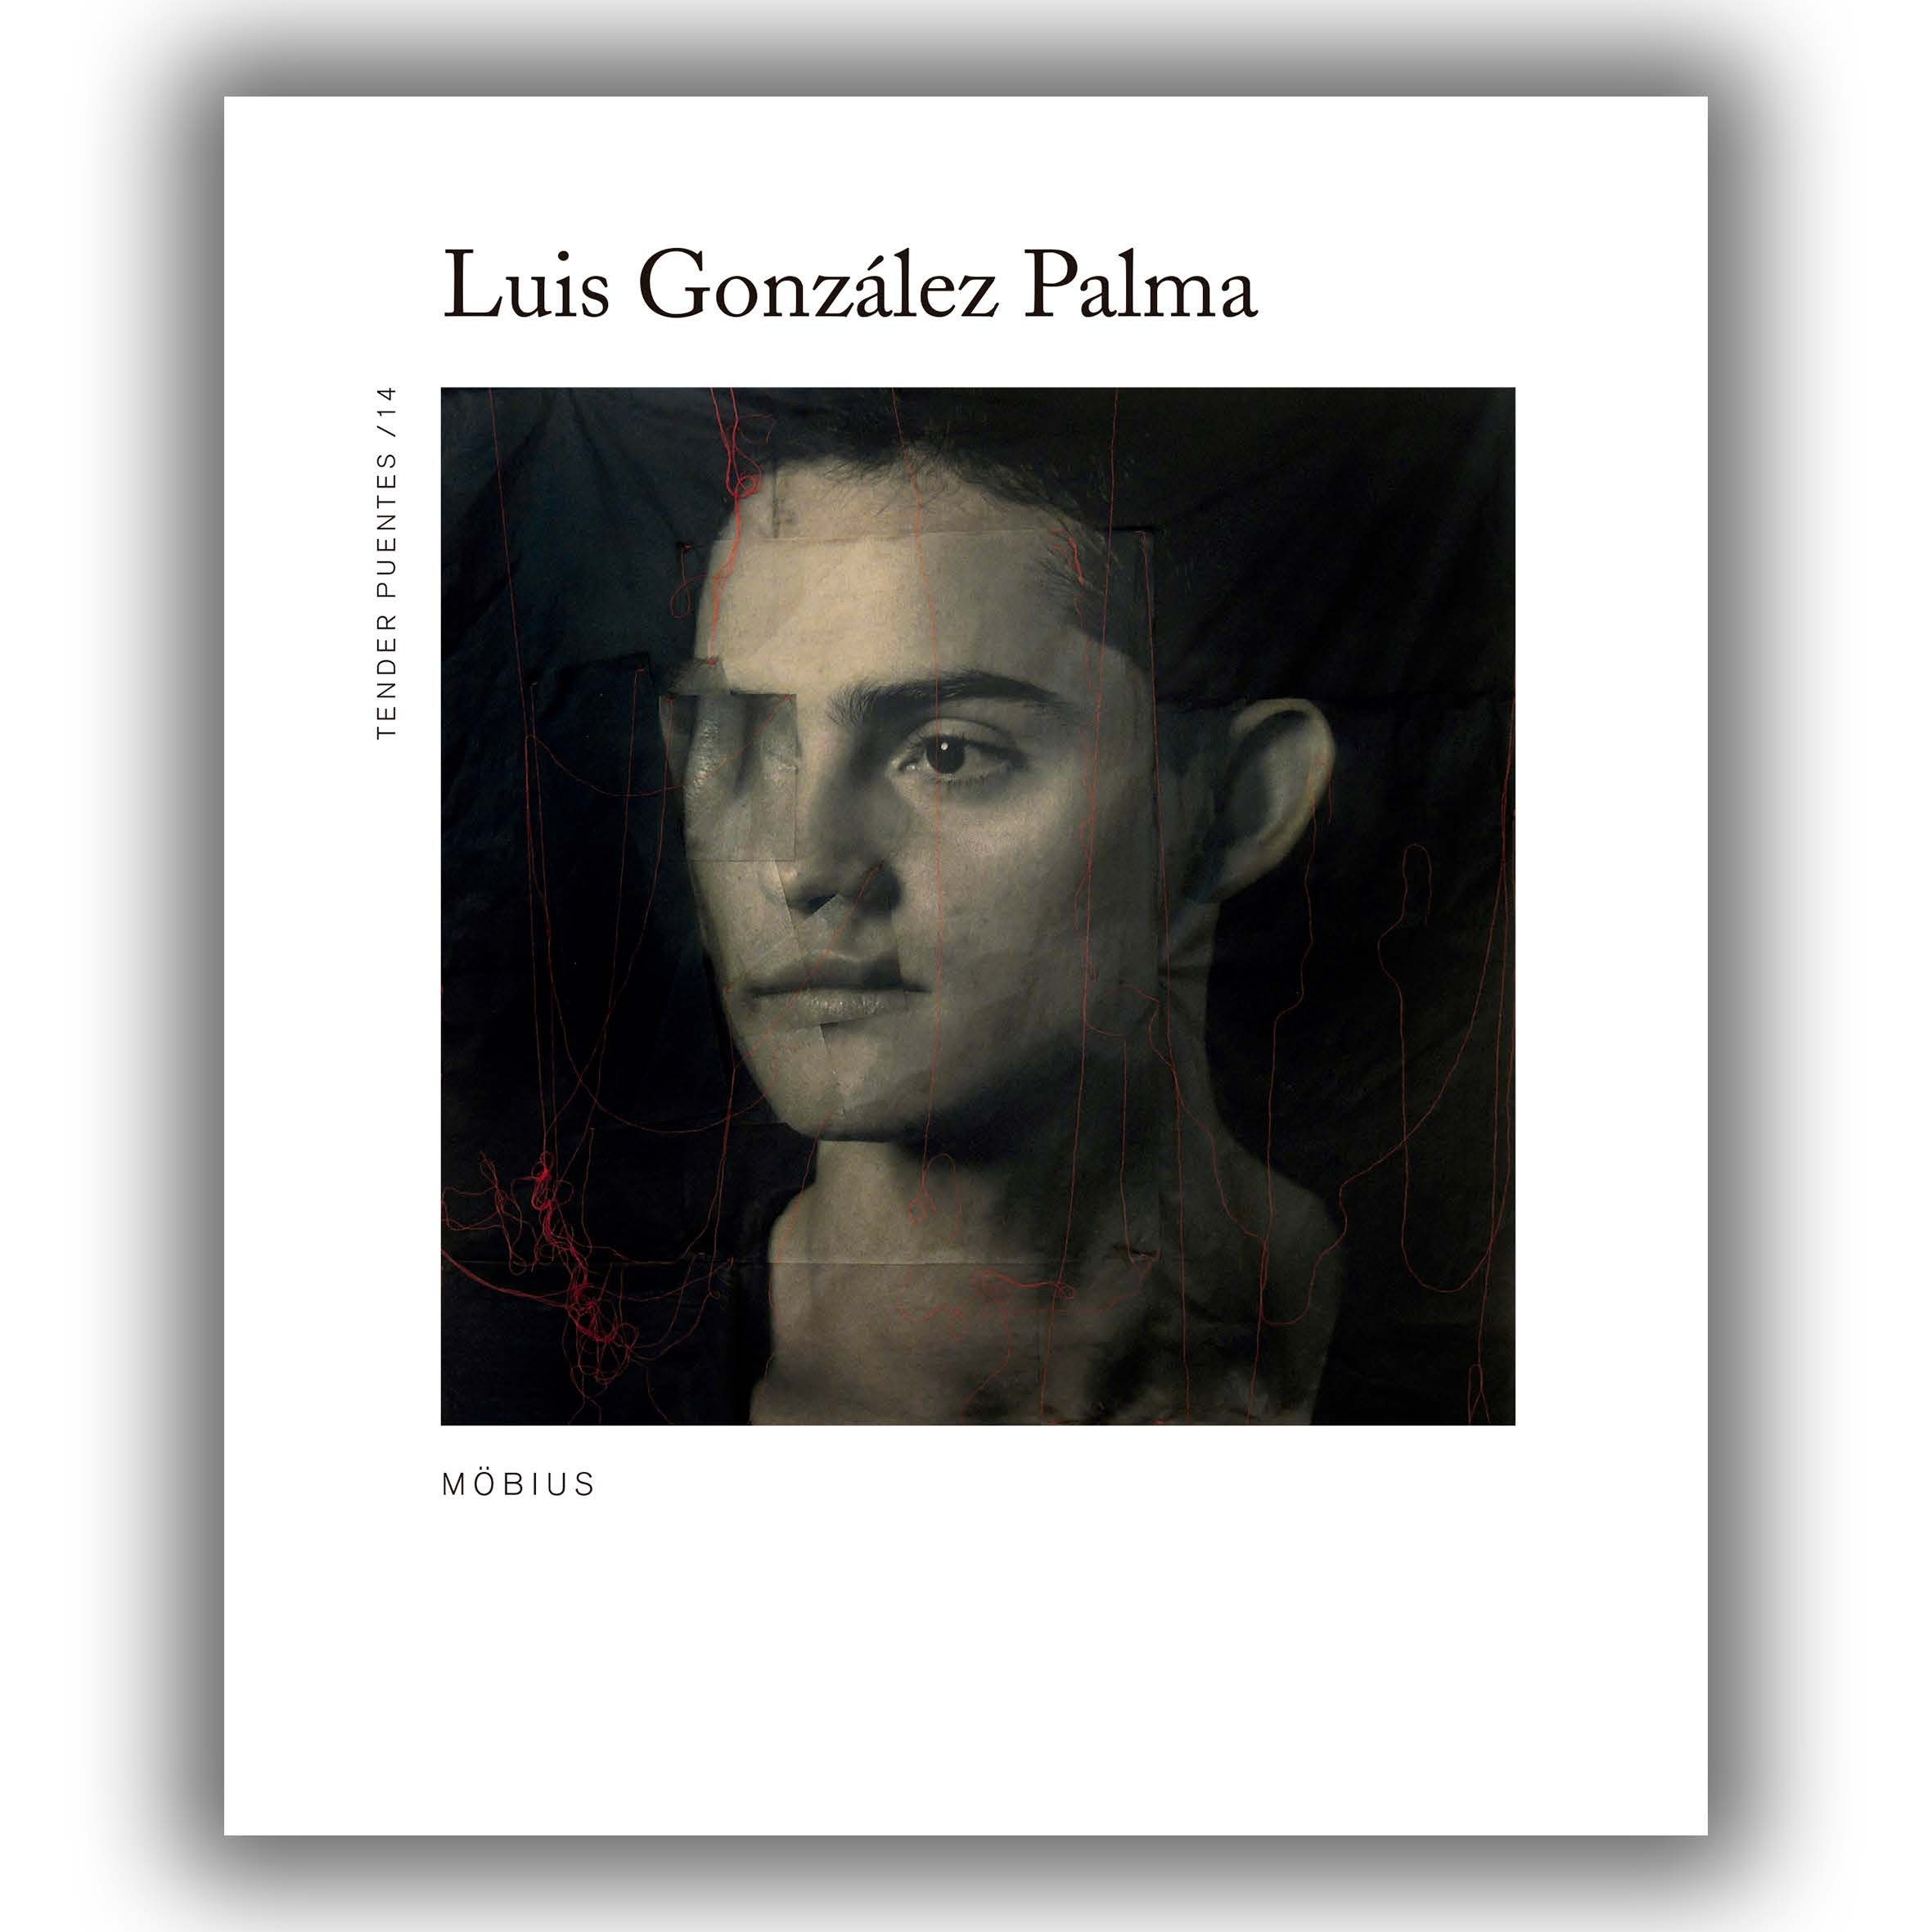 Mobius - Gonzalez Palma Luis